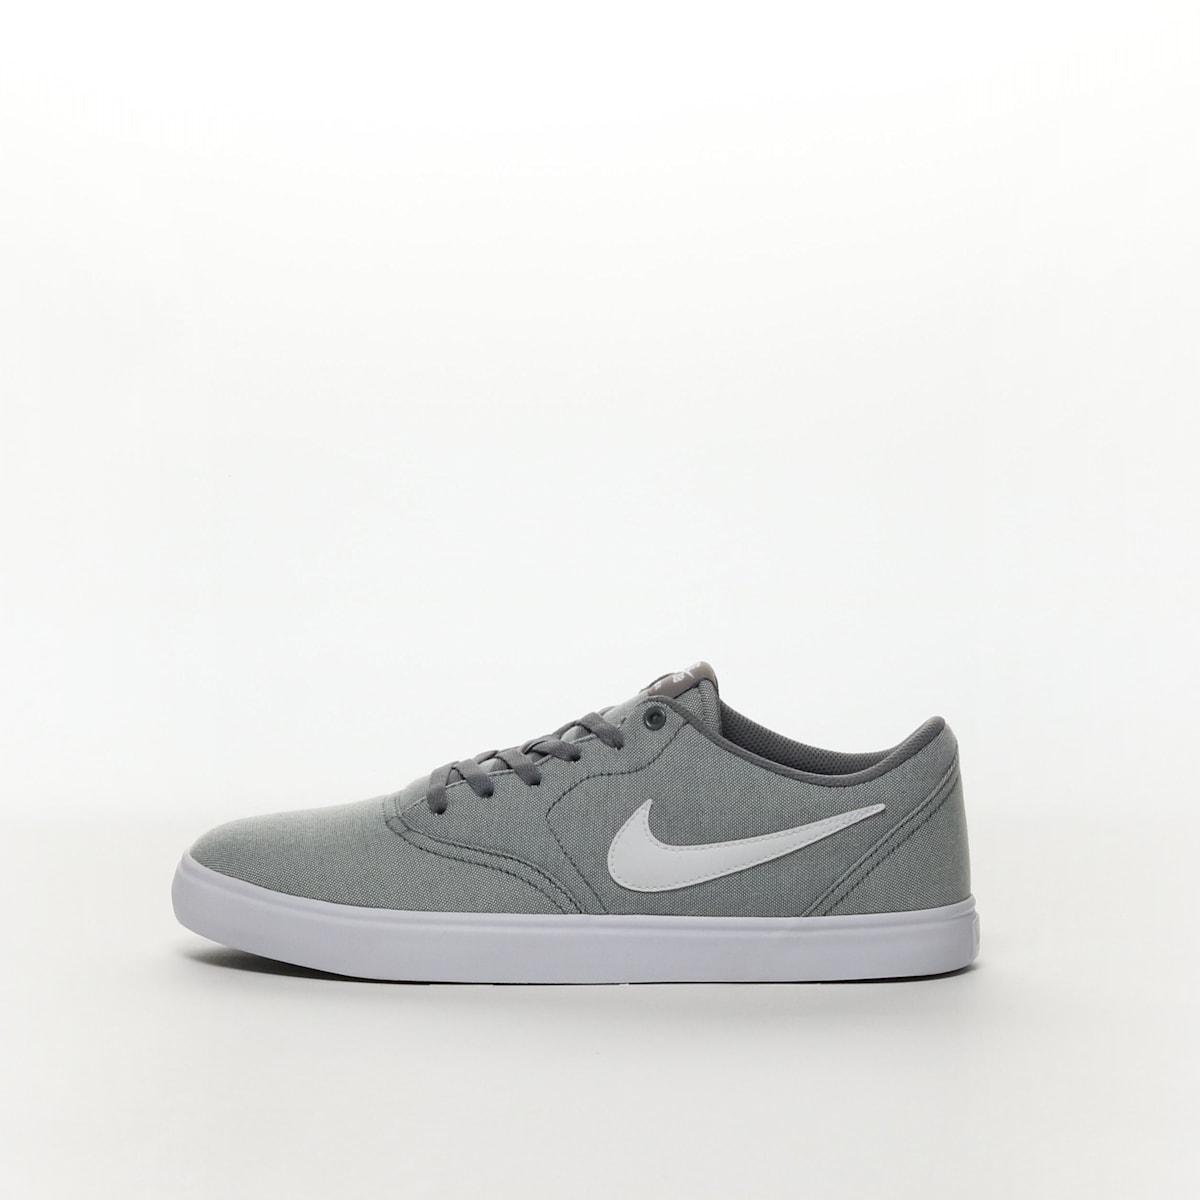 buy online c4762 2e460 ... Nike SB Check Solarsoft Canvas Skateboarding.  Actual Shoe